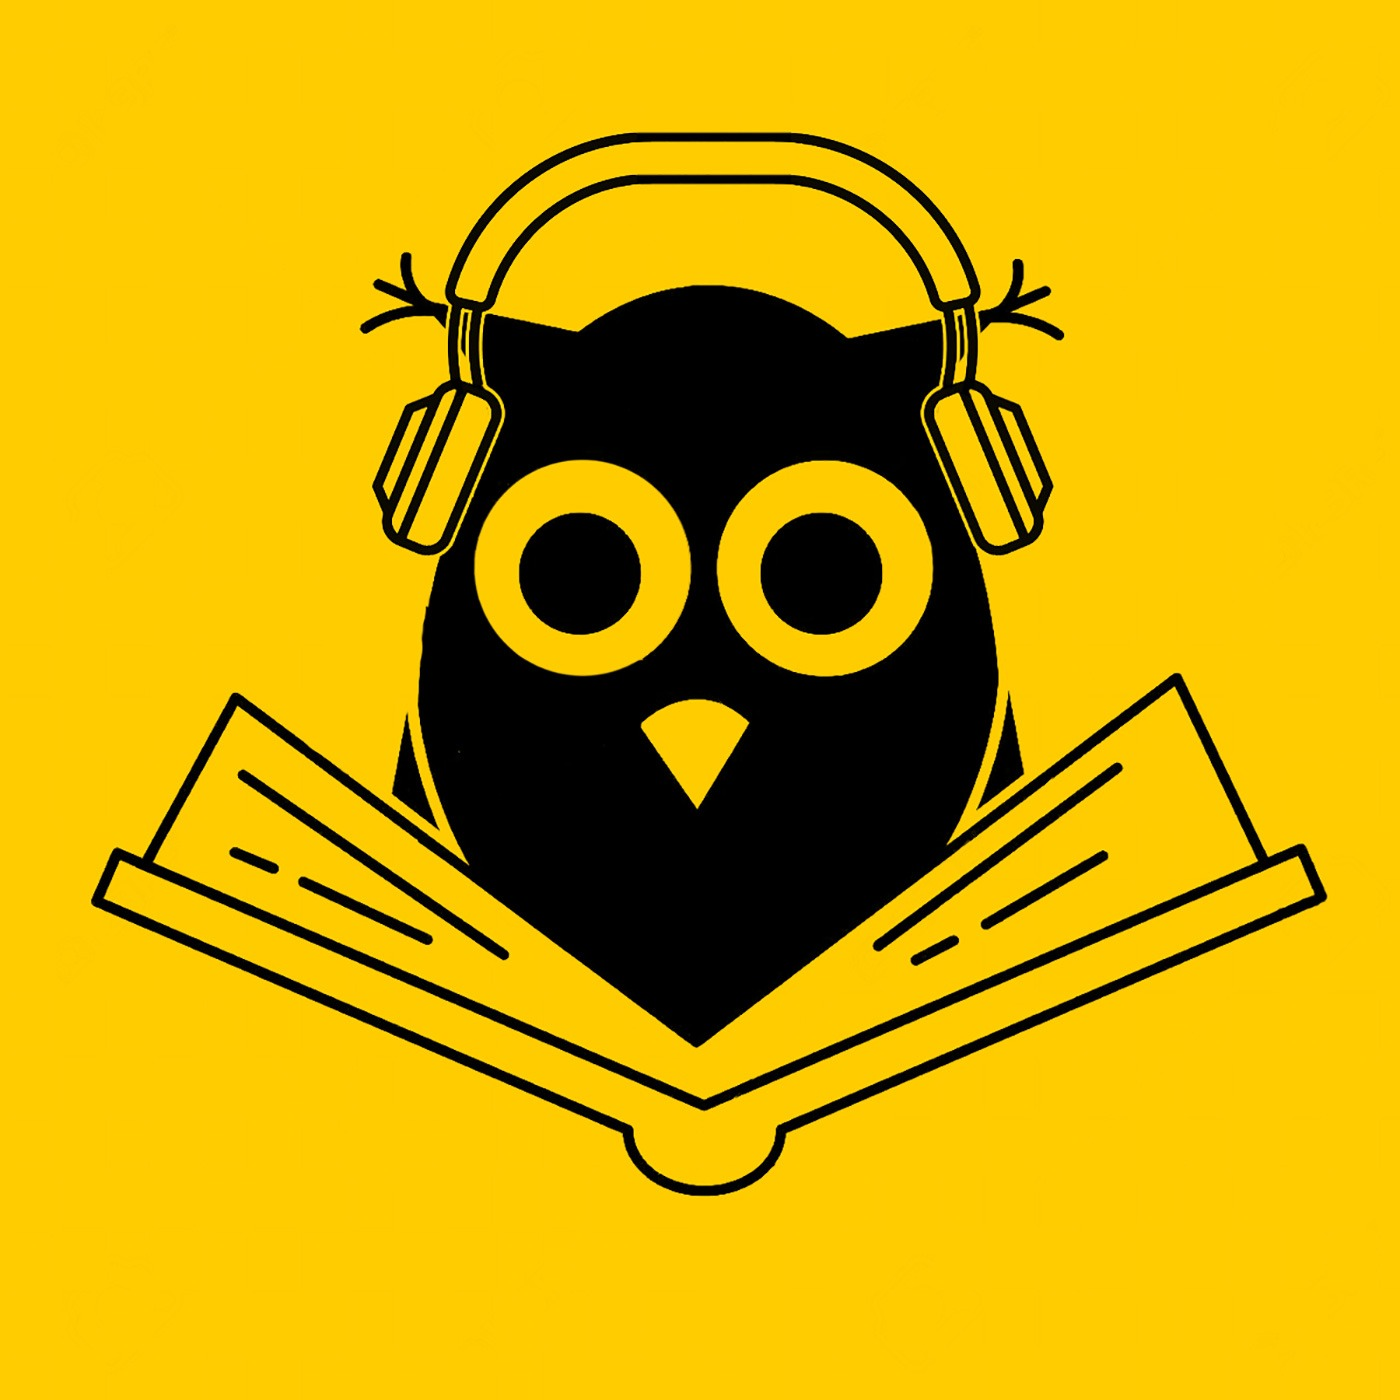 Tarikh Mige Podcast | پادکست تاریخ میگه